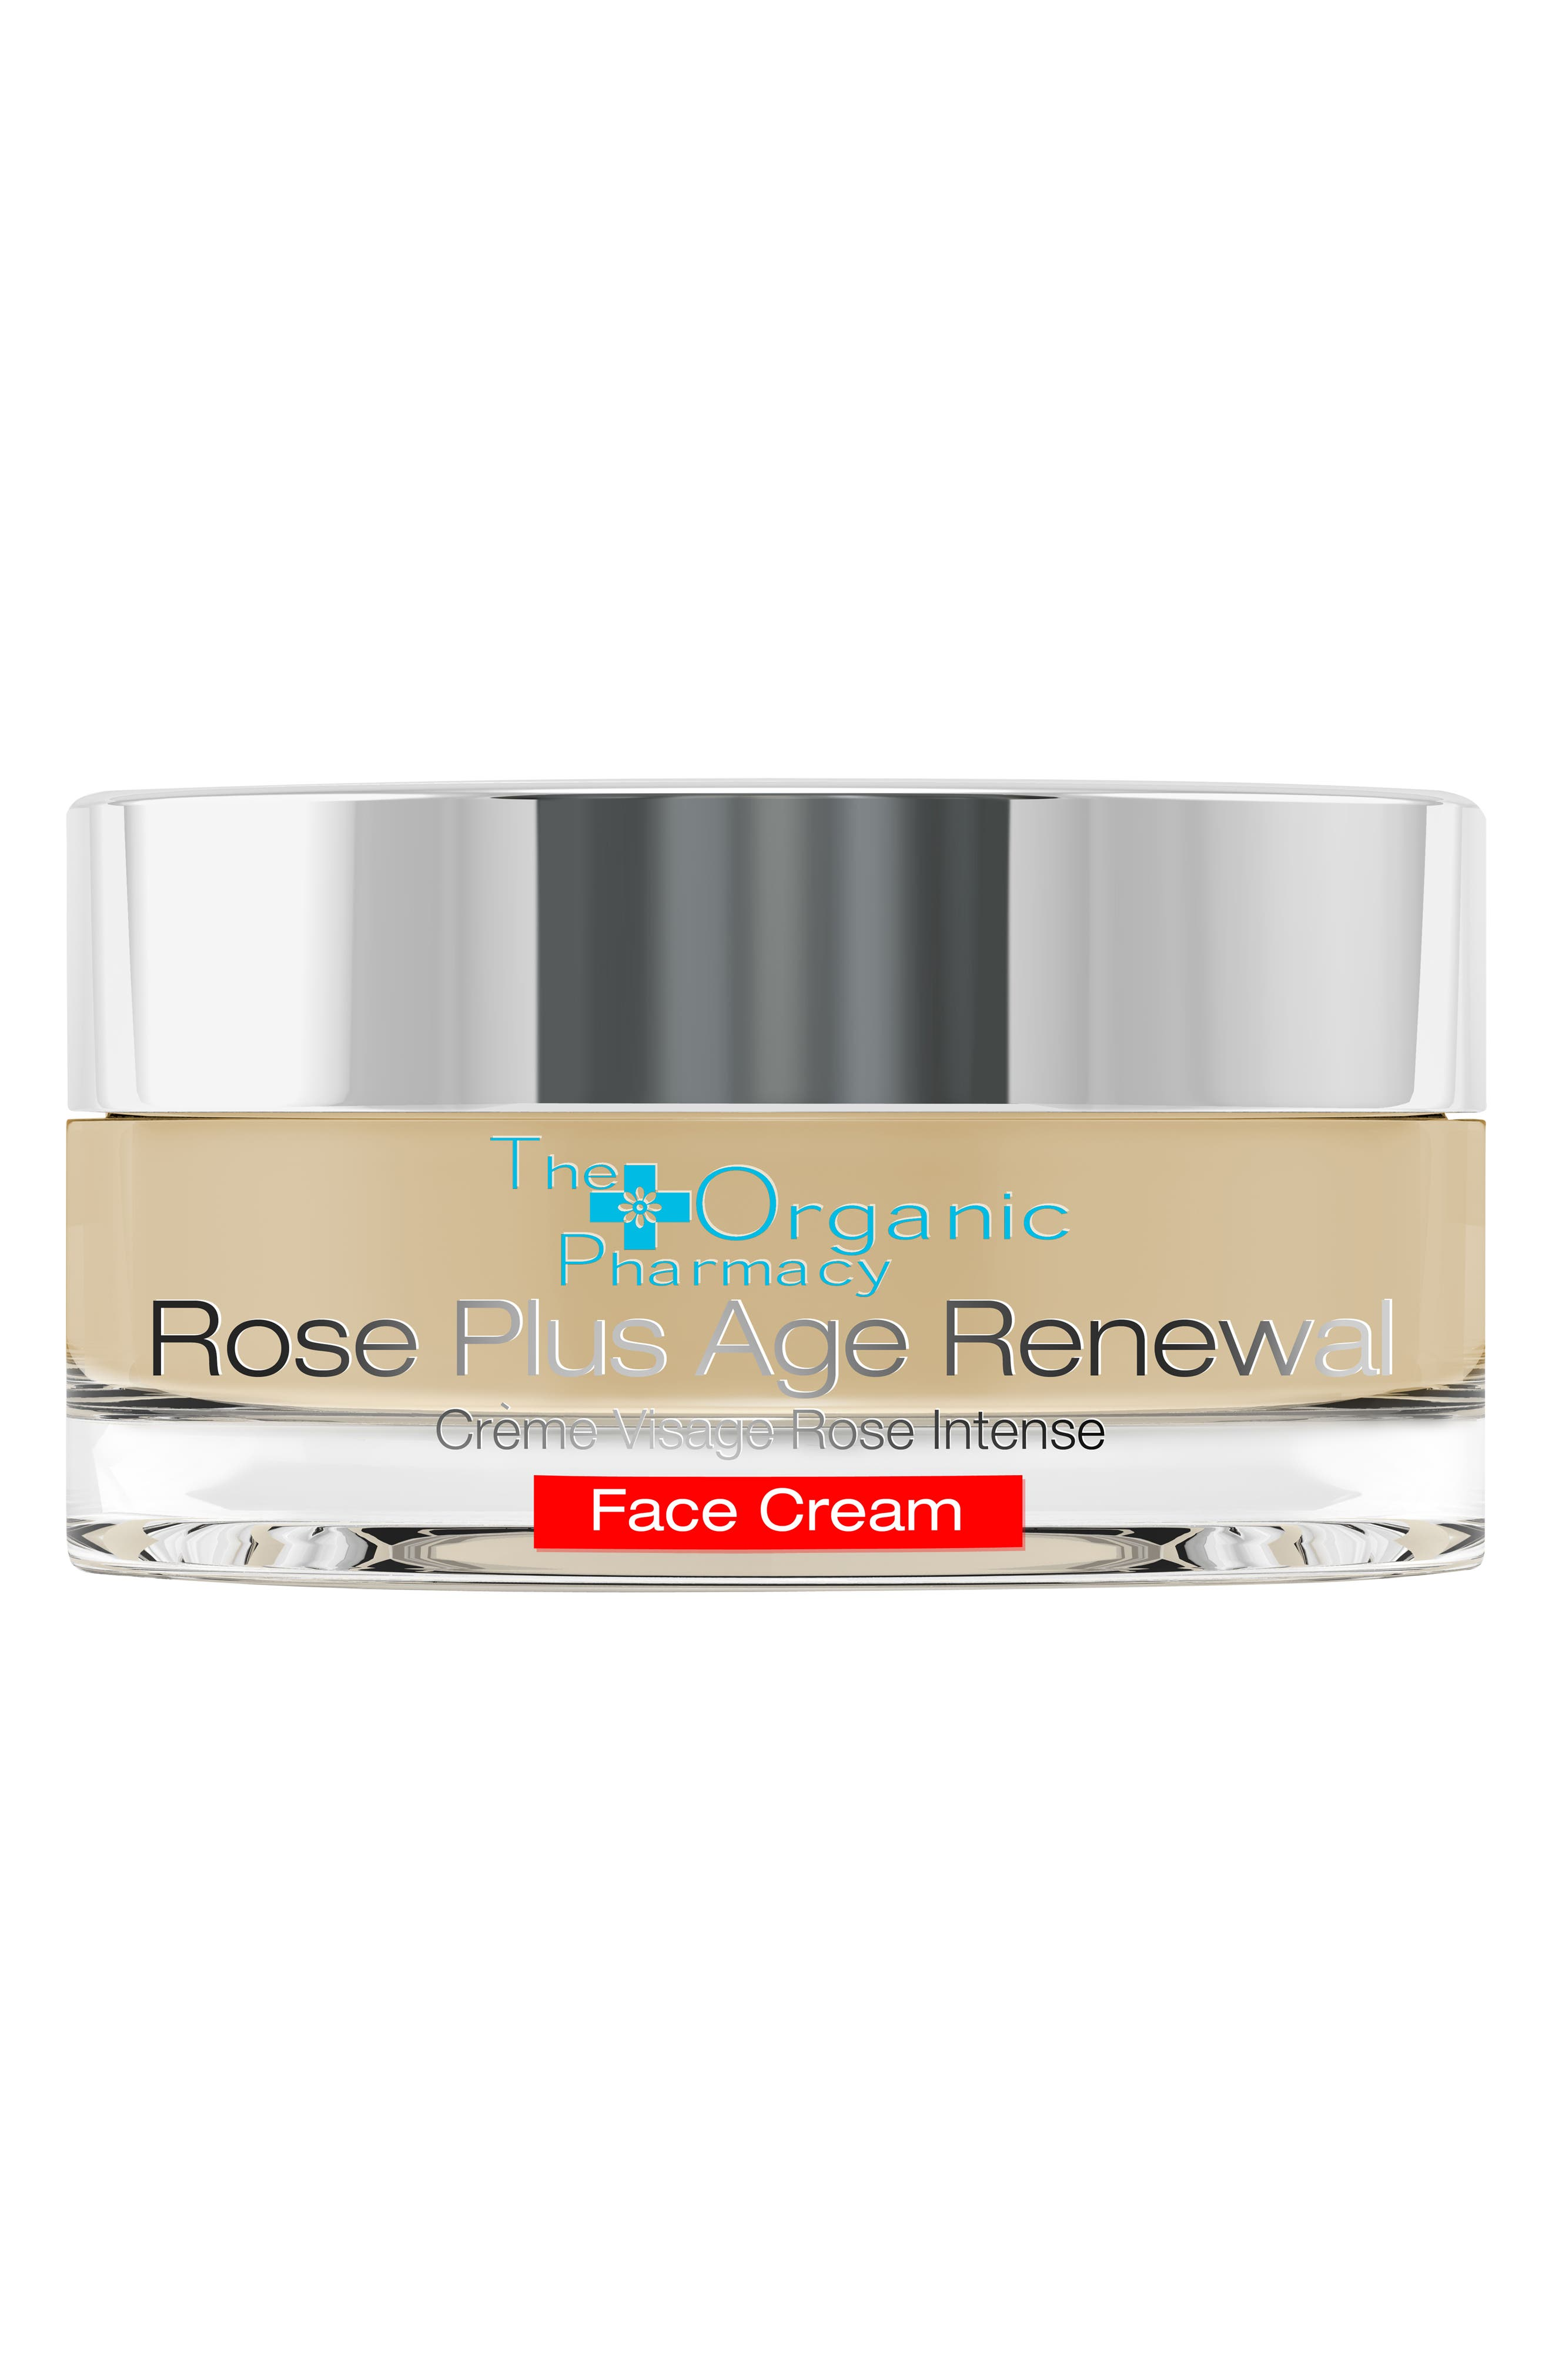 Rose Plus Age Renewal Face Cream,                             Main thumbnail 1, color,                             NO COLOR